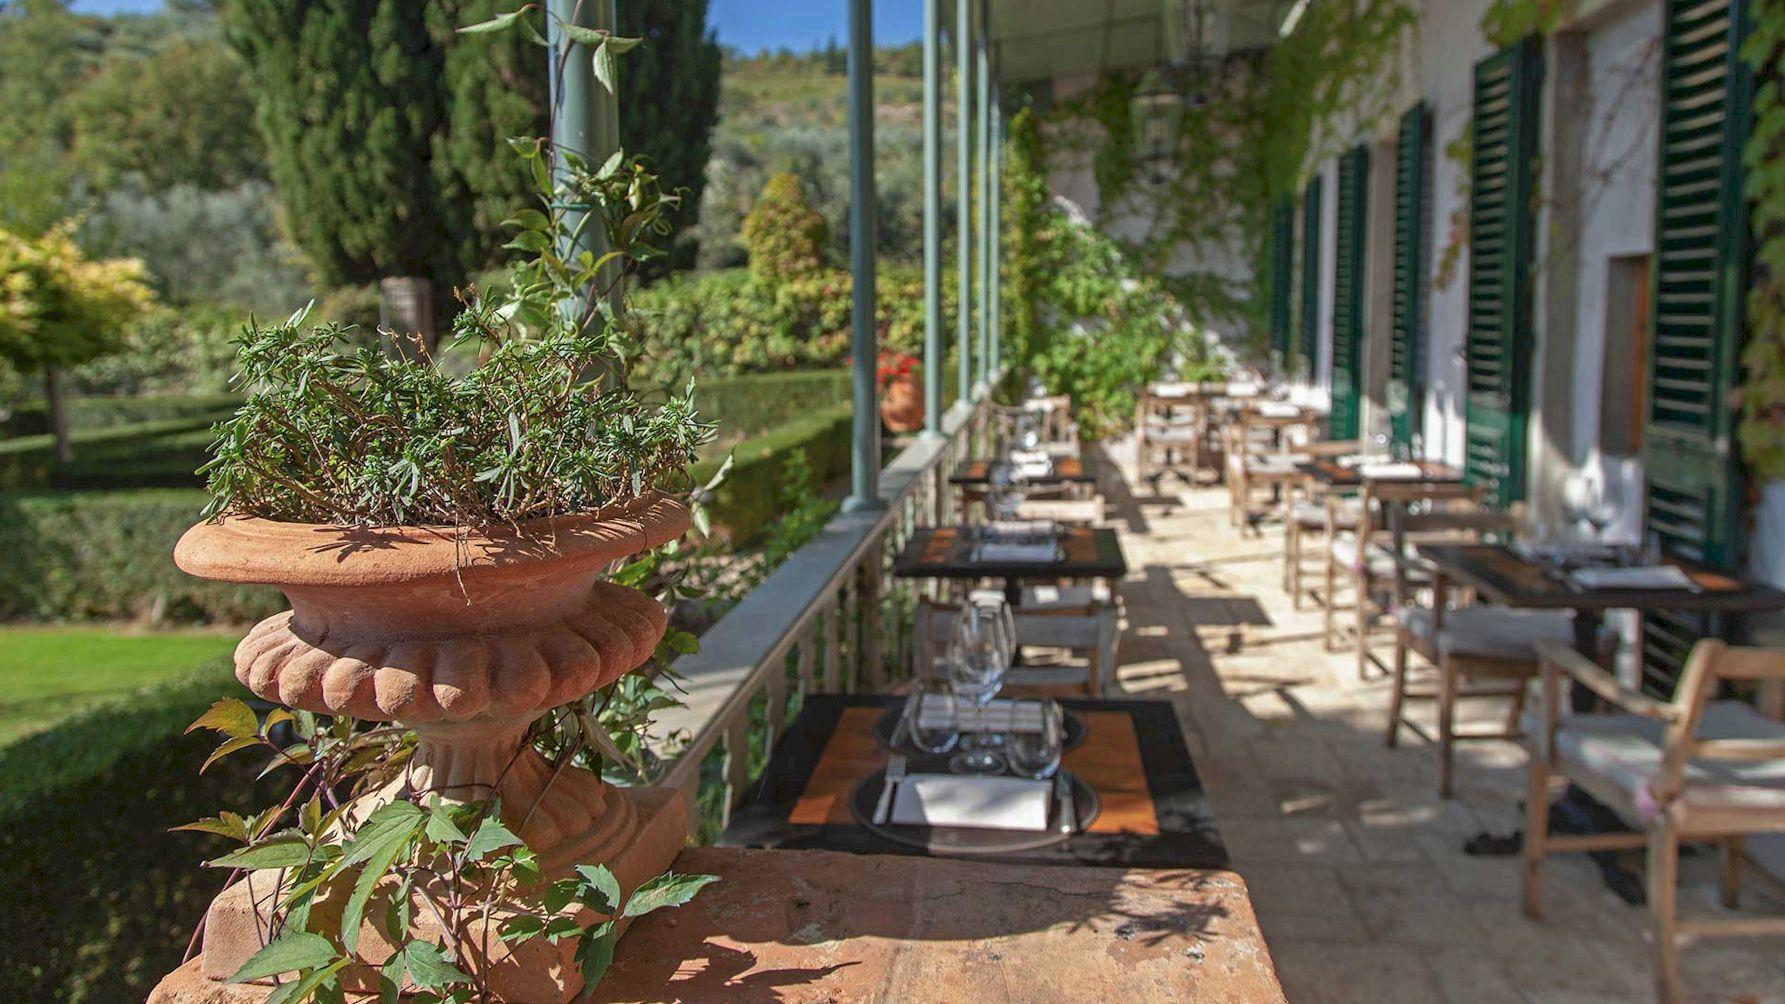 Villa Bordoni verandah by day